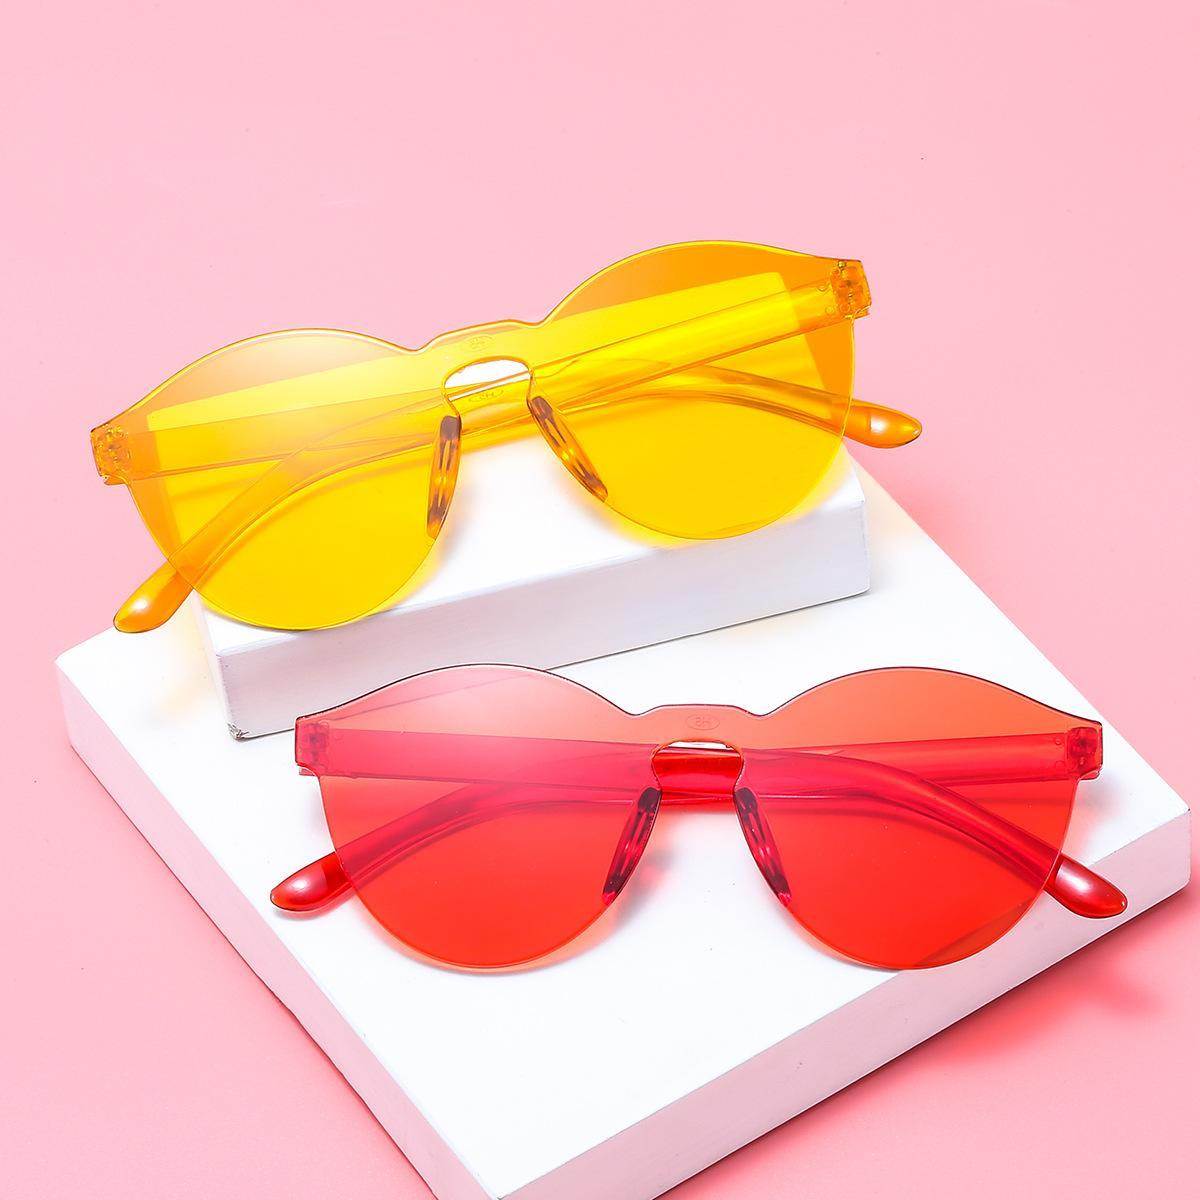 Atacado-3 estilo de verão mulheres sem aro óculos de sol transparente tons óculos de sol feminino fresco doce cor uv400 eyewear oculos de sol hzyj288